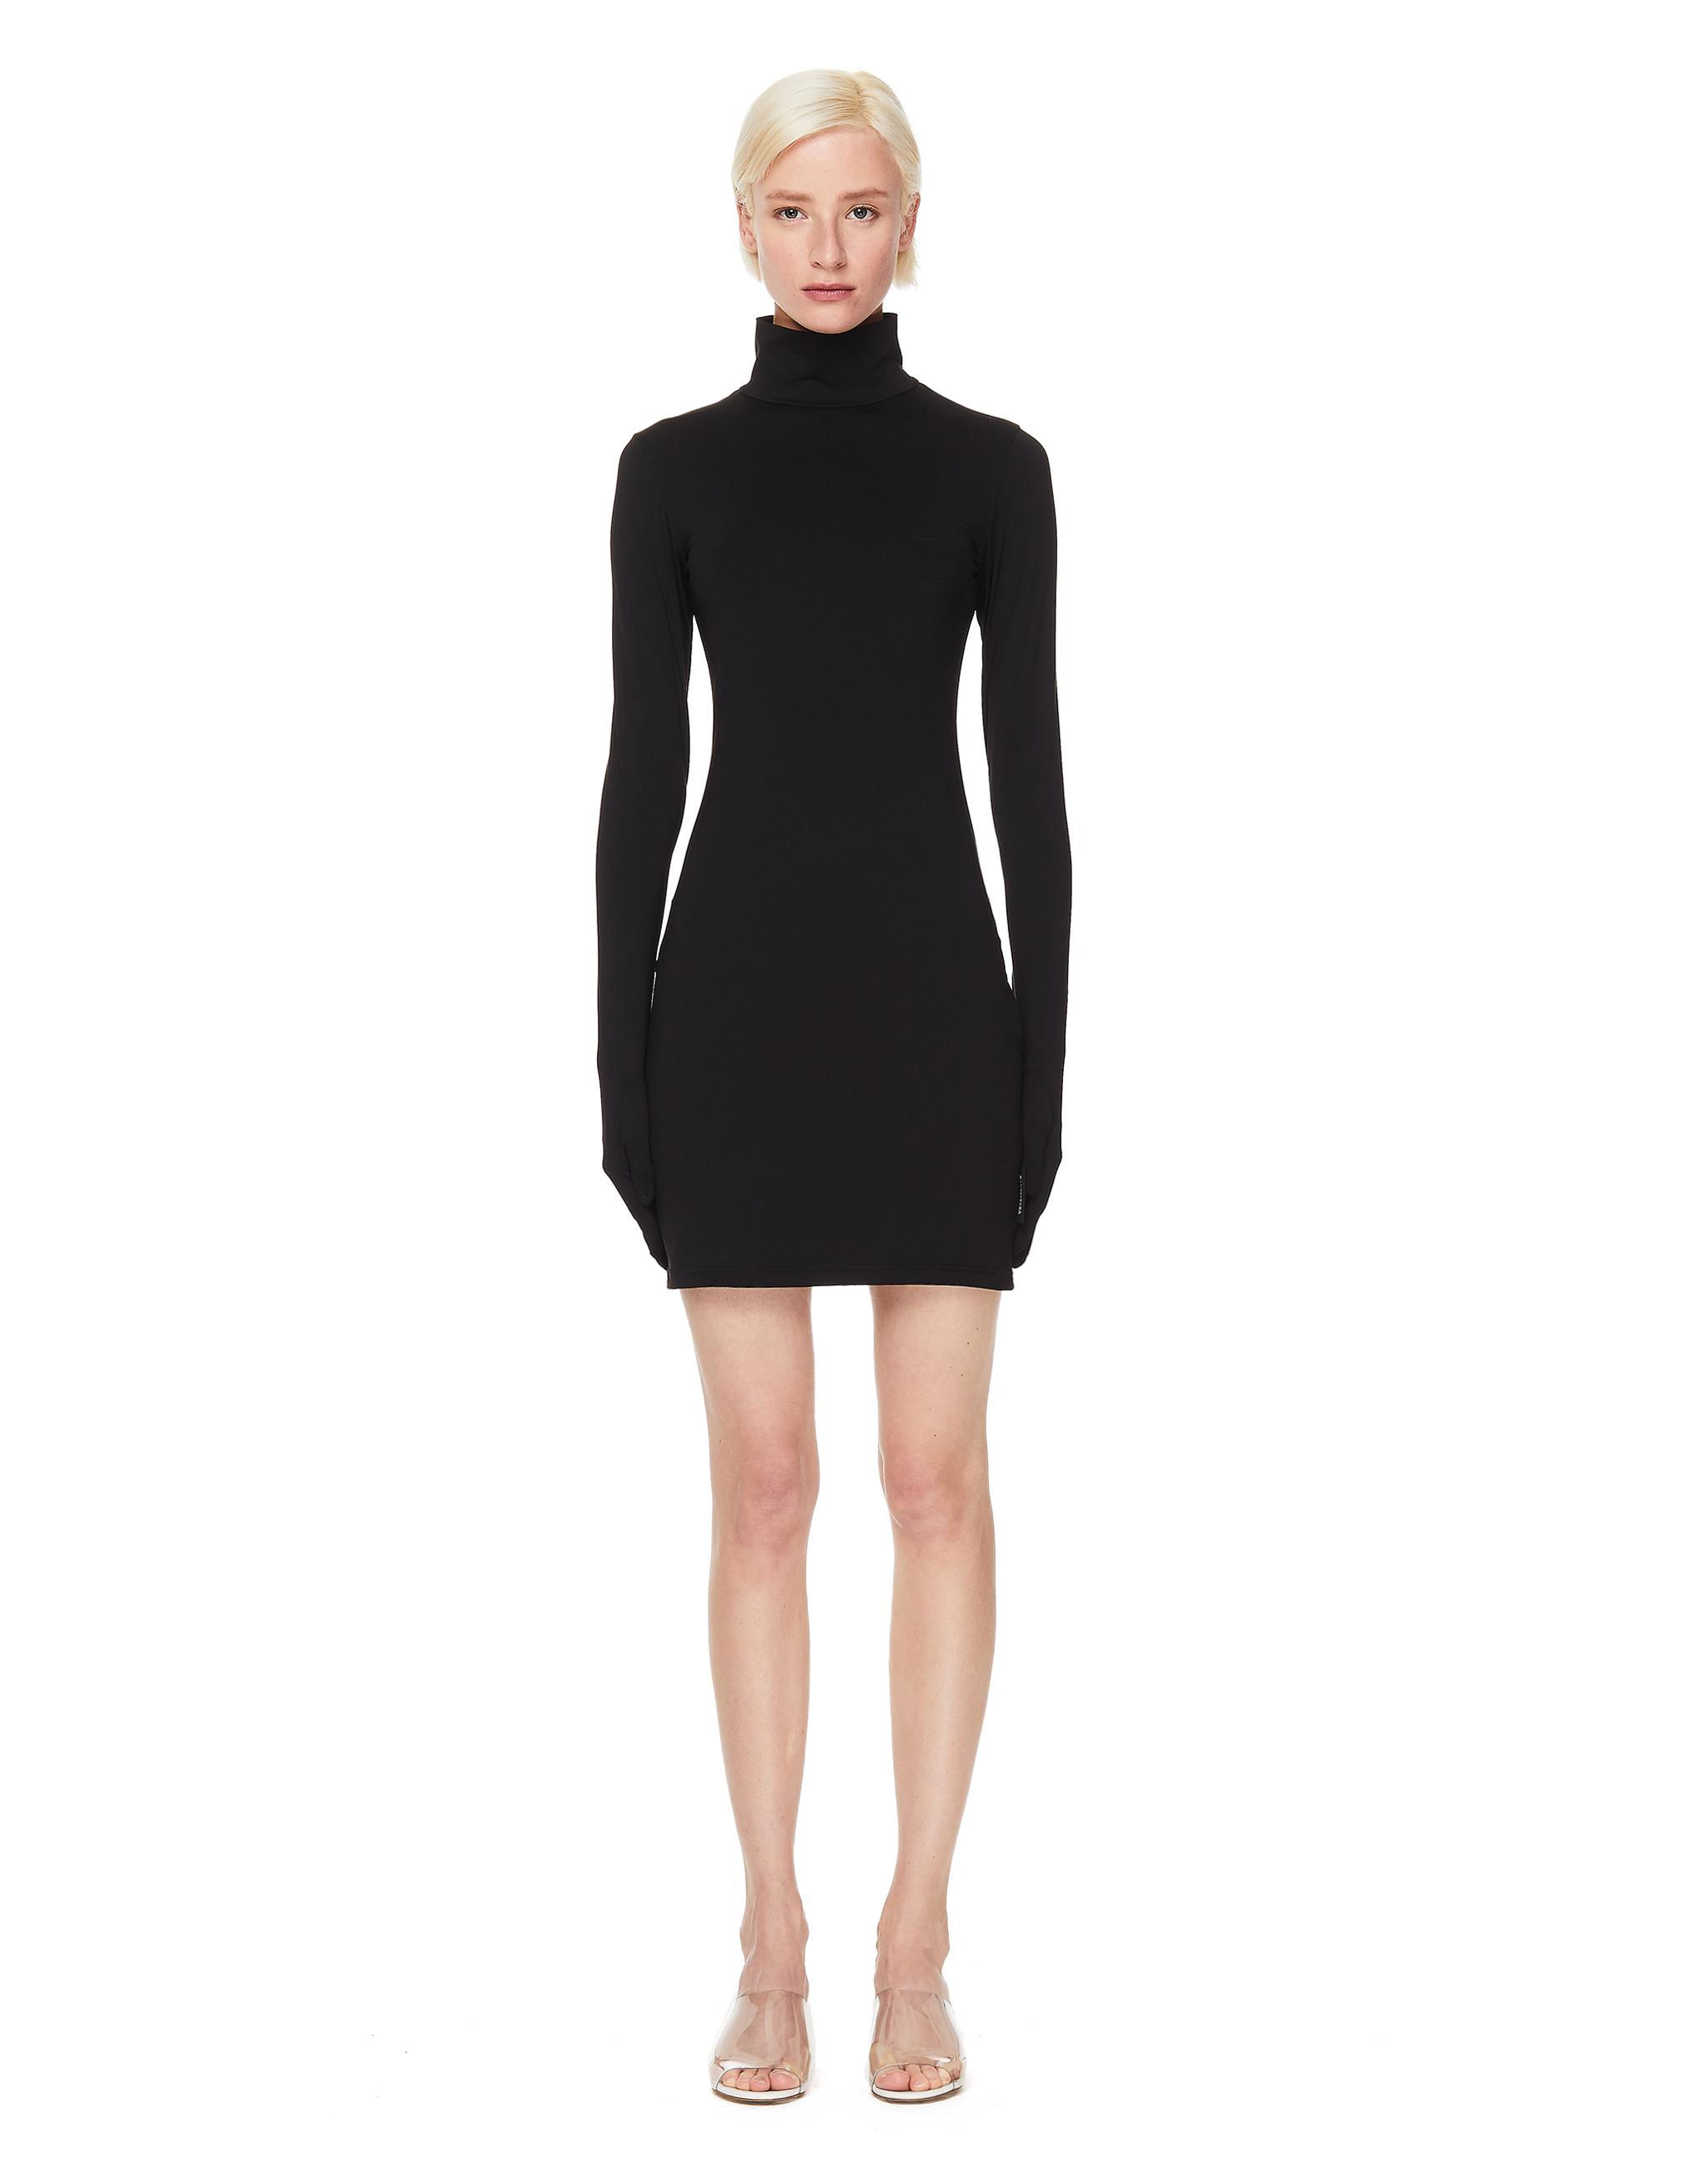 Vetements Black Mini Dress With Gloves